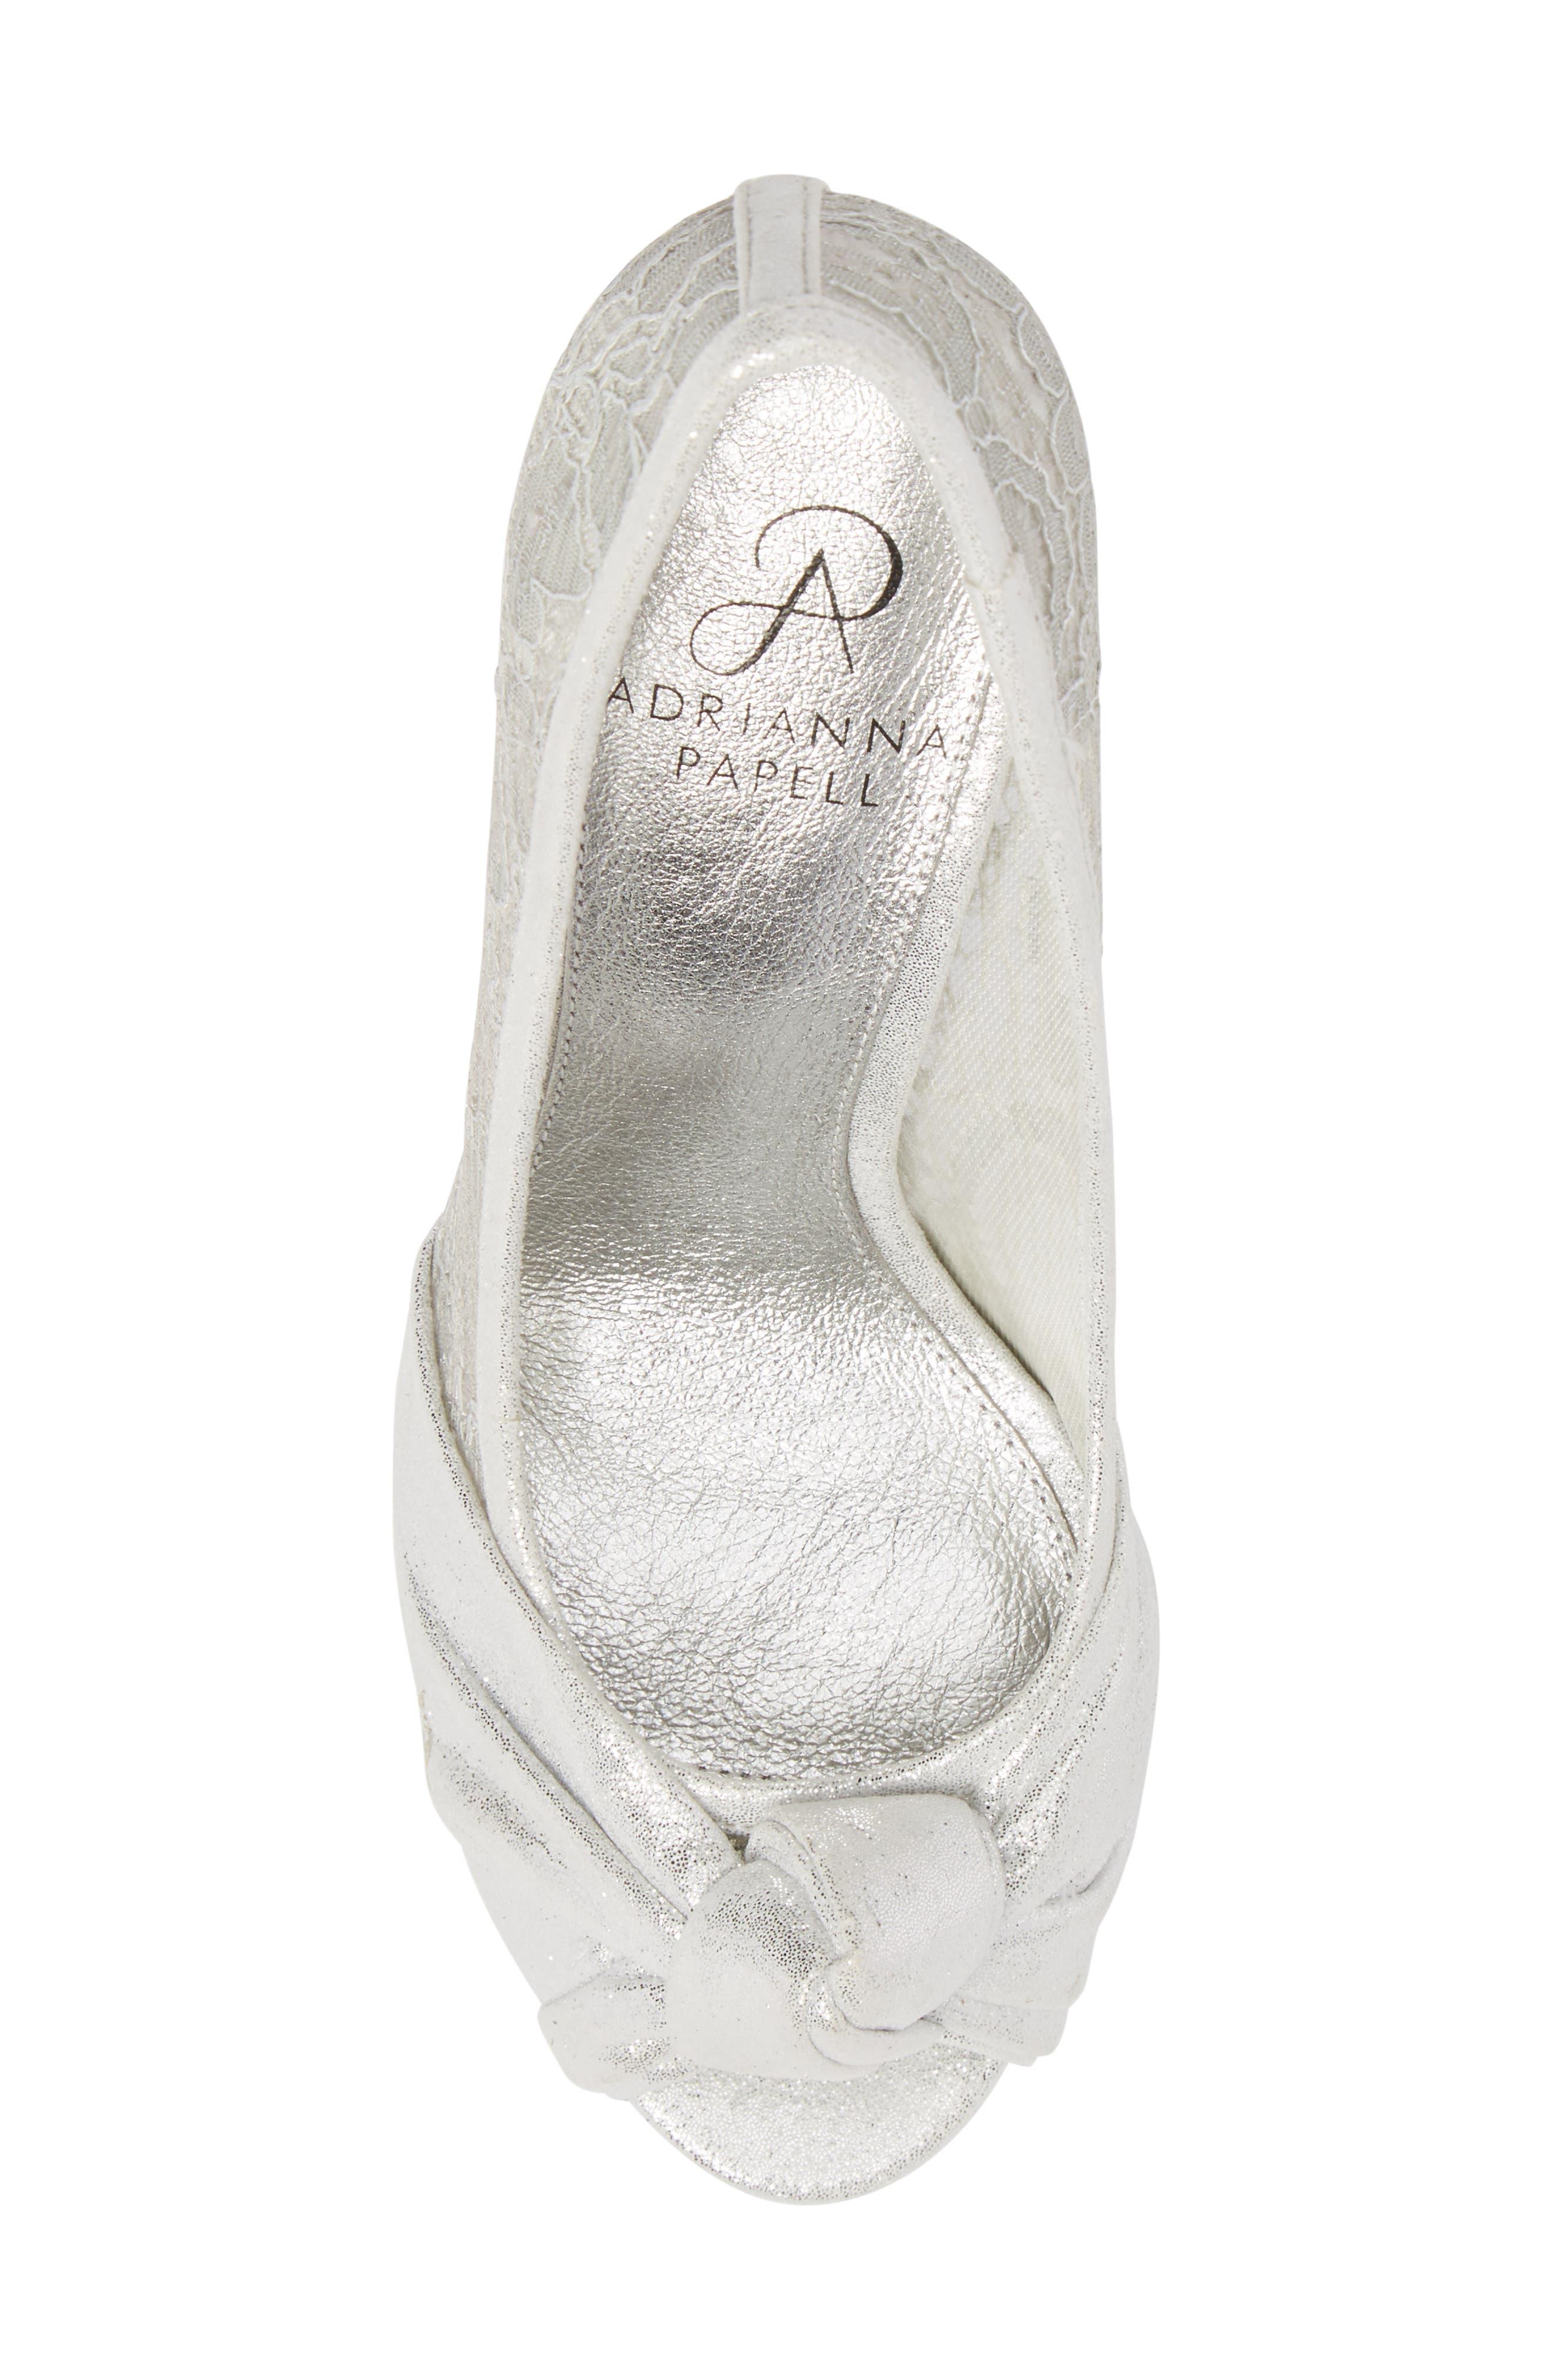 Francesca Knotted Peep Toe Pump,                             Alternate thumbnail 6, color,                             Silver Satin